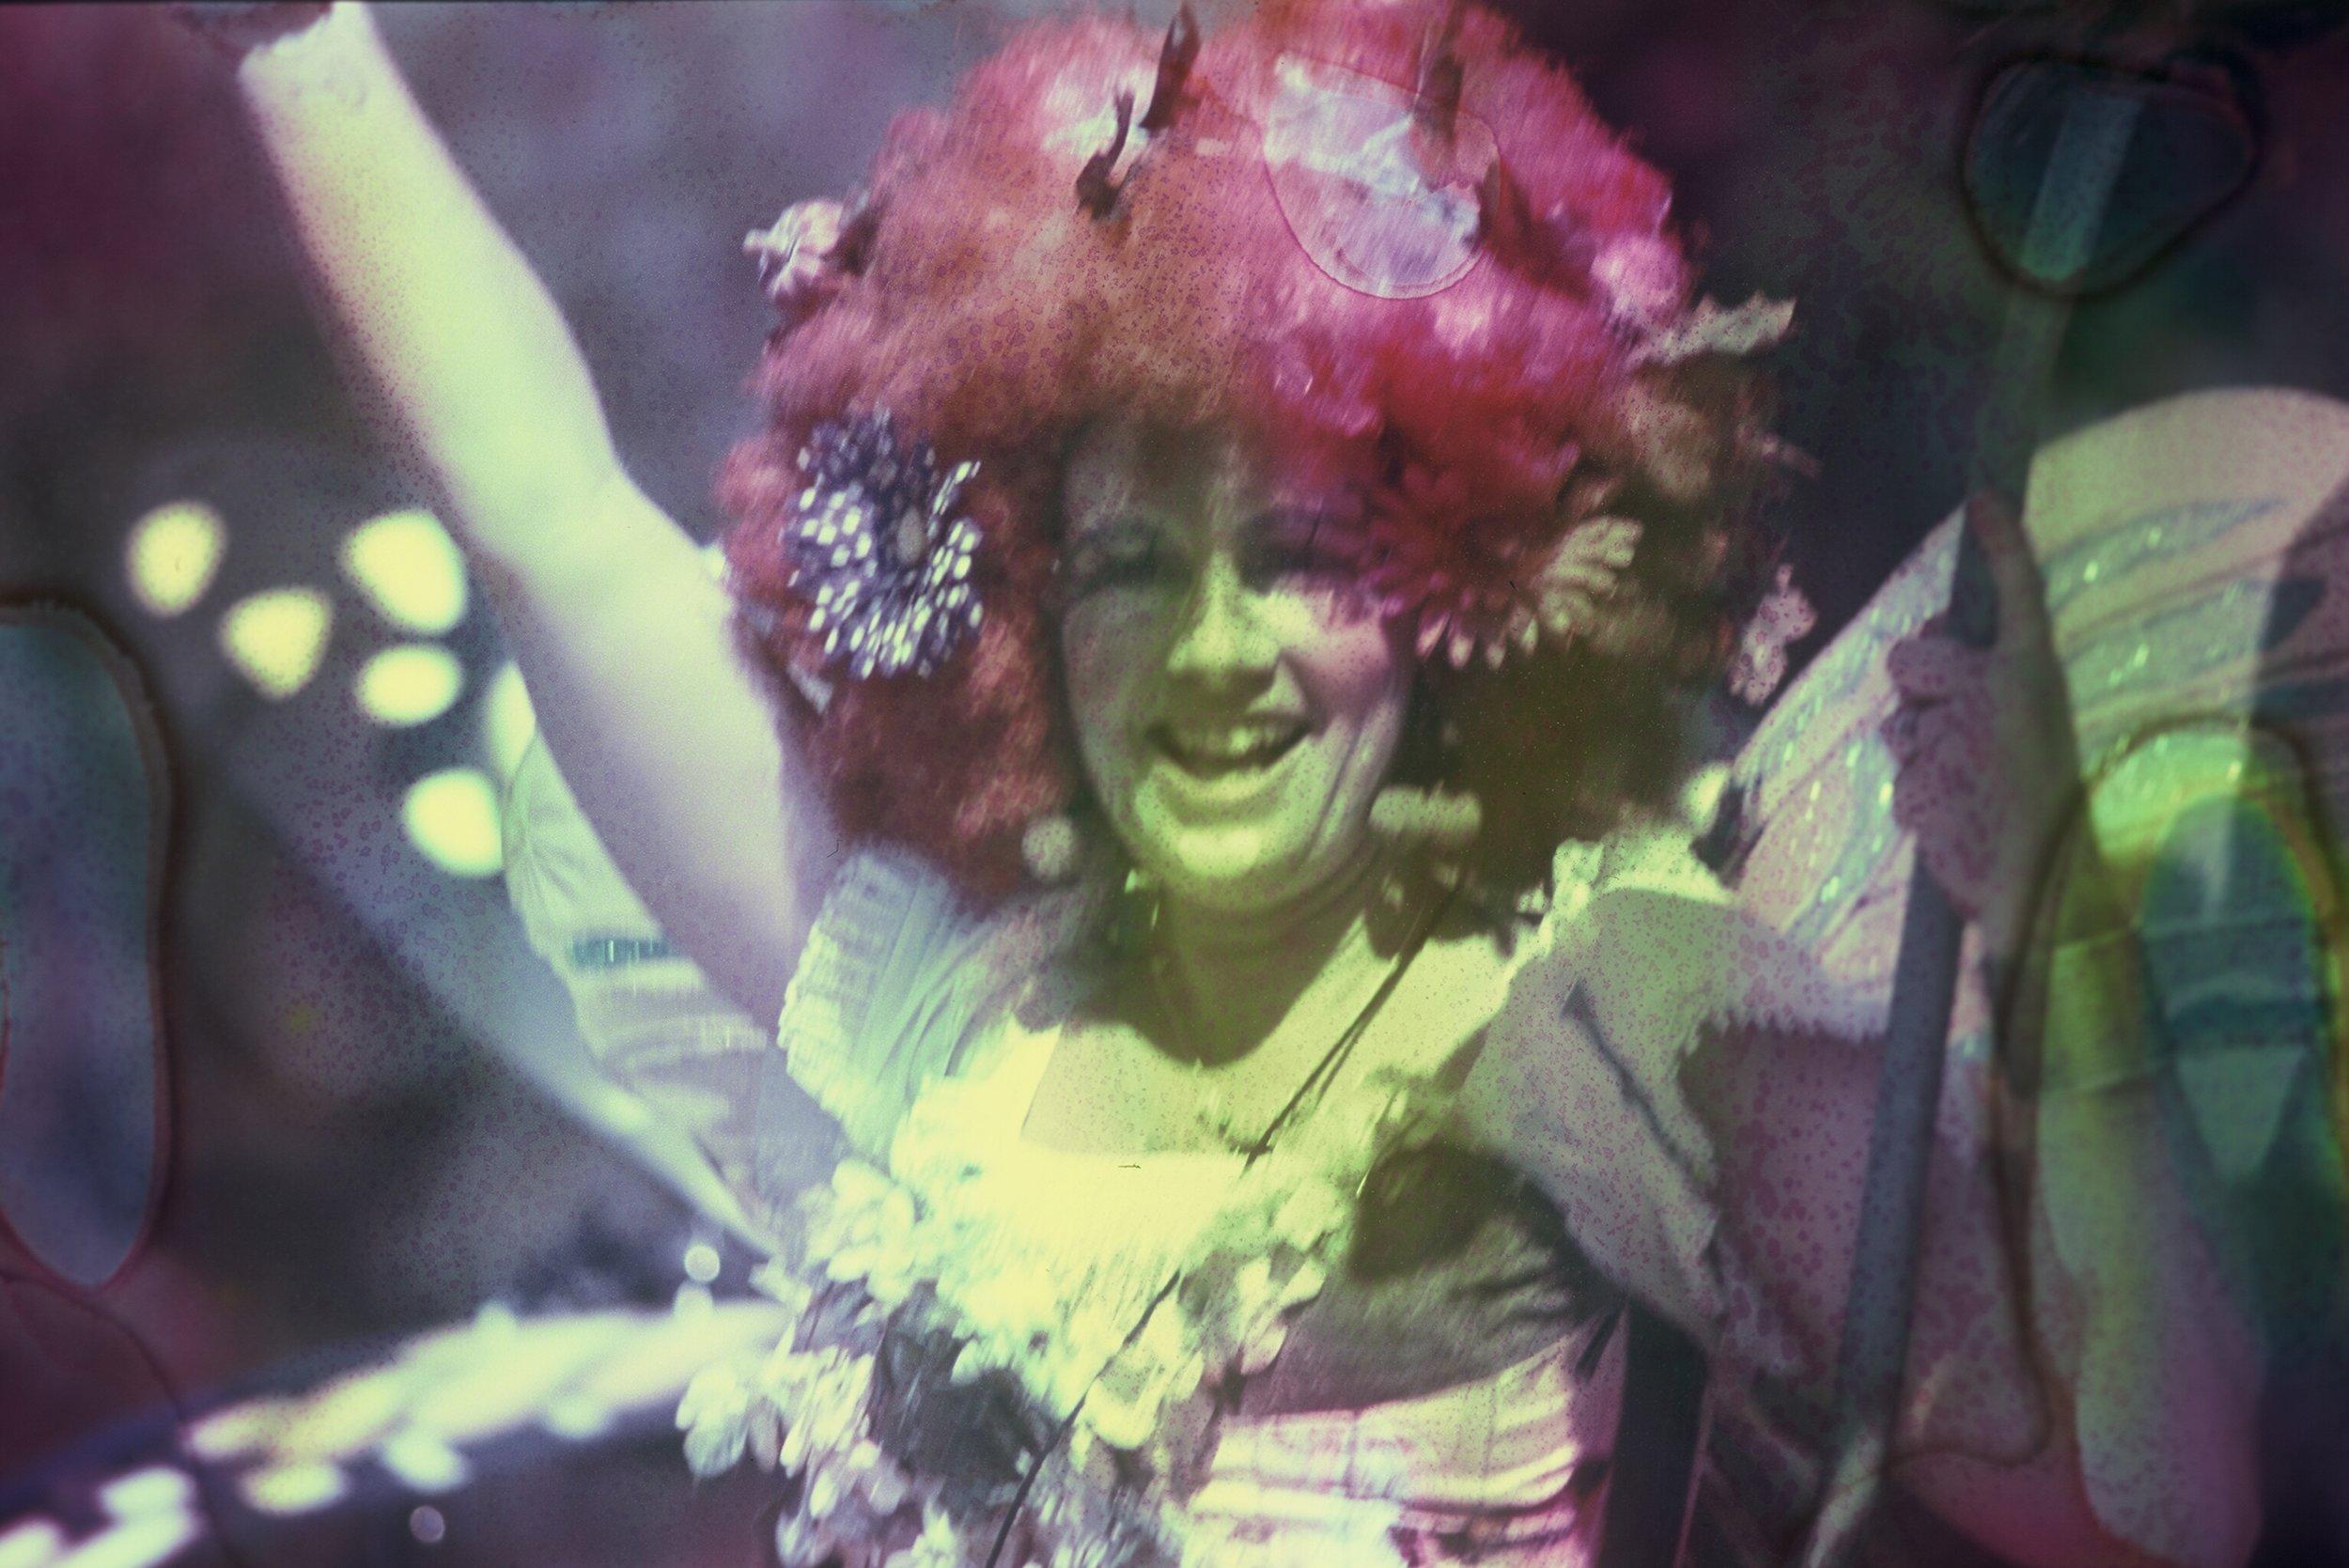 Circus fairy | Pentax K1000 - Fuji Velvia 100 soaked in absynthe | Barbara Murray